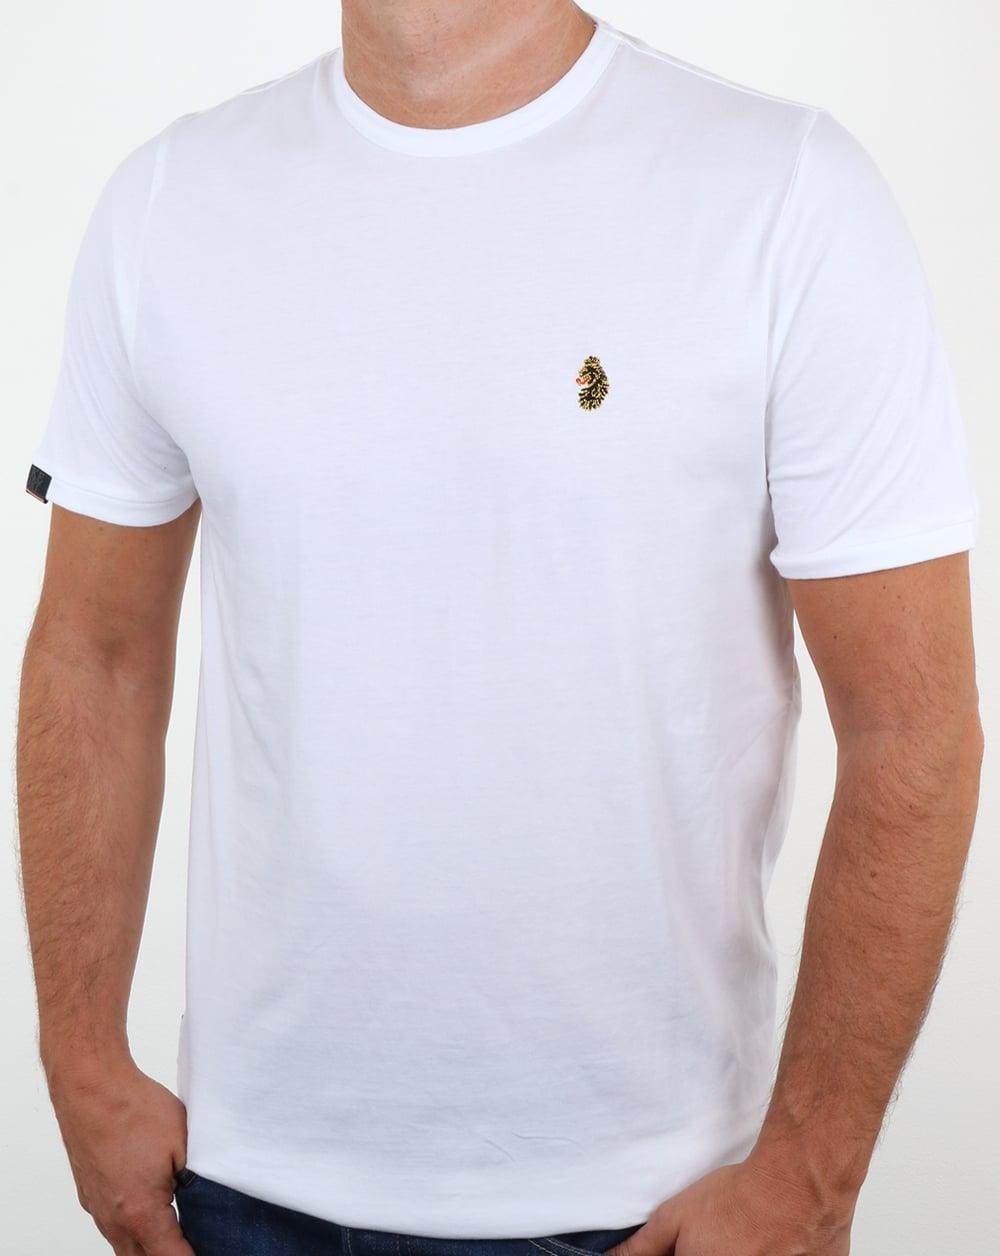 c0bb222b Luke Traff T Shirt White,tee,logo,crew neck,cotton,mens